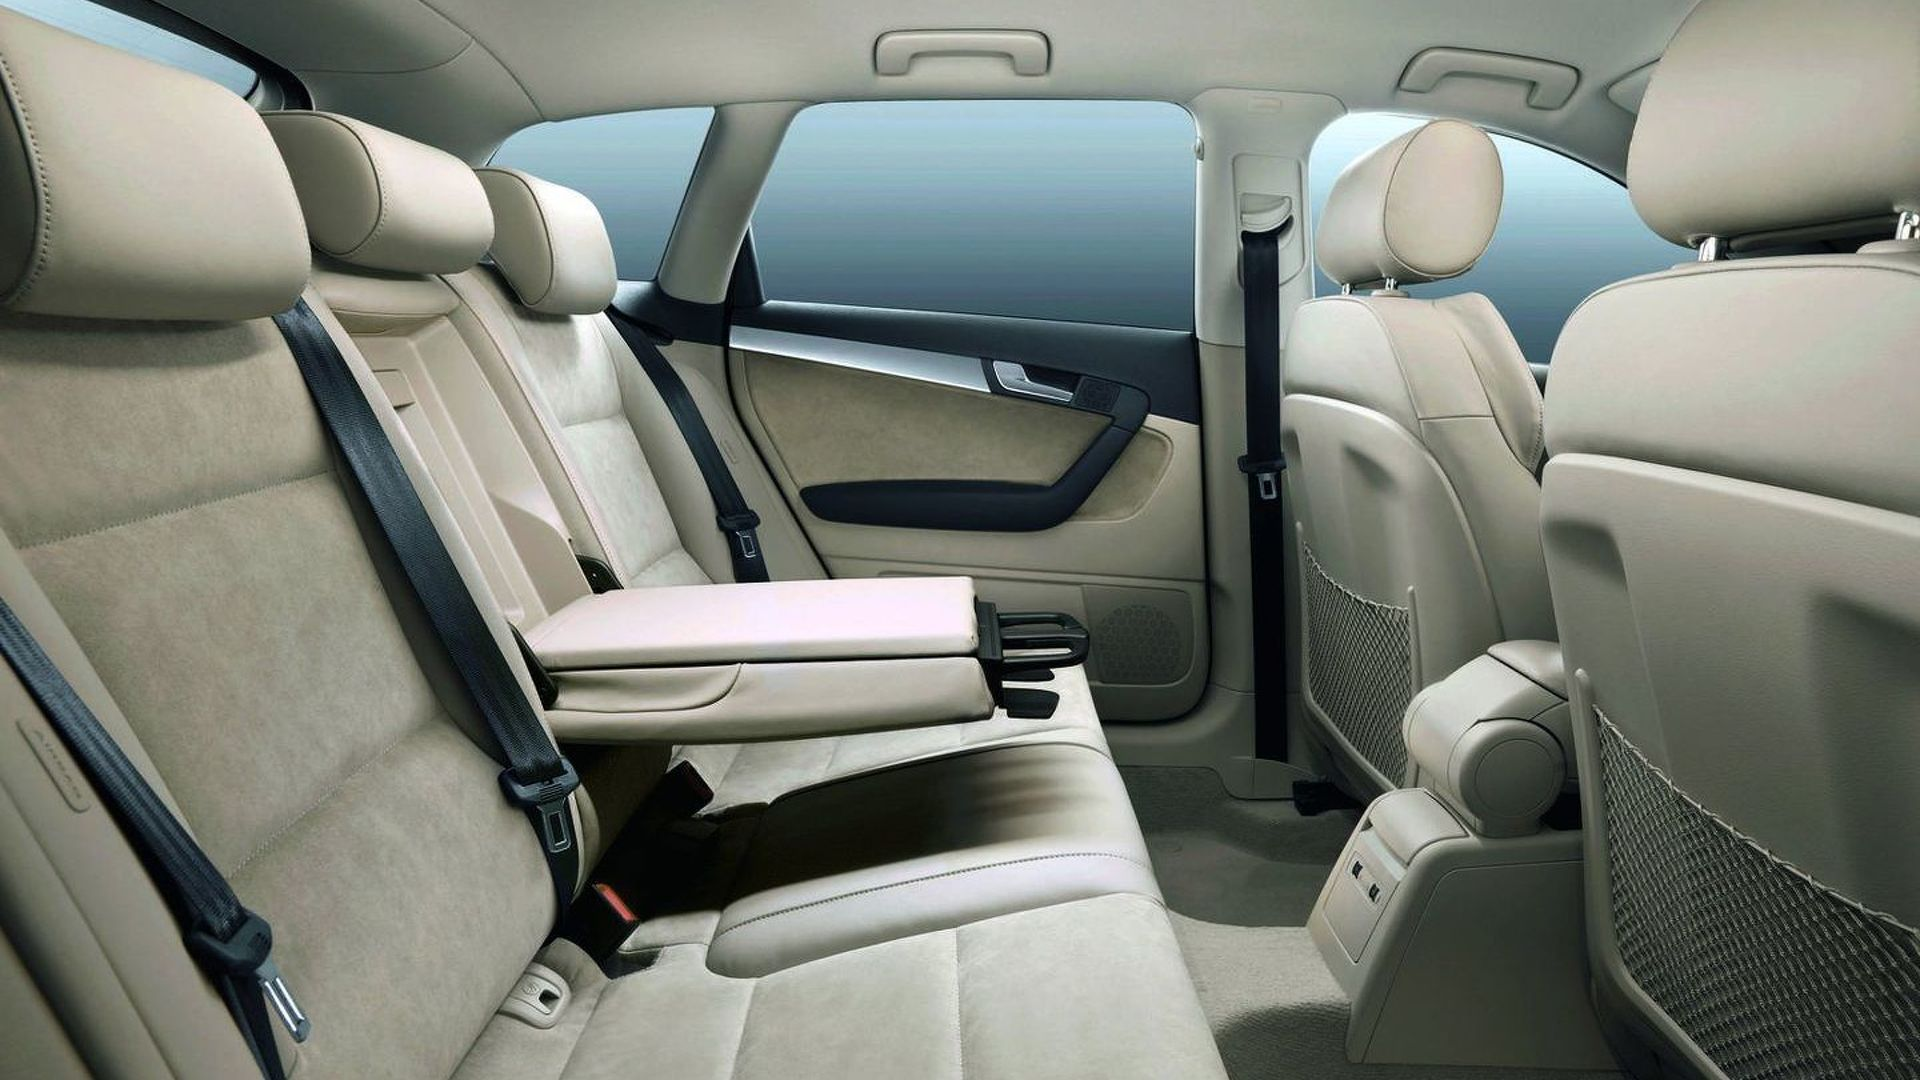 Kekurangan Audi A3 Sportback 2011 Top Model Tahun Ini